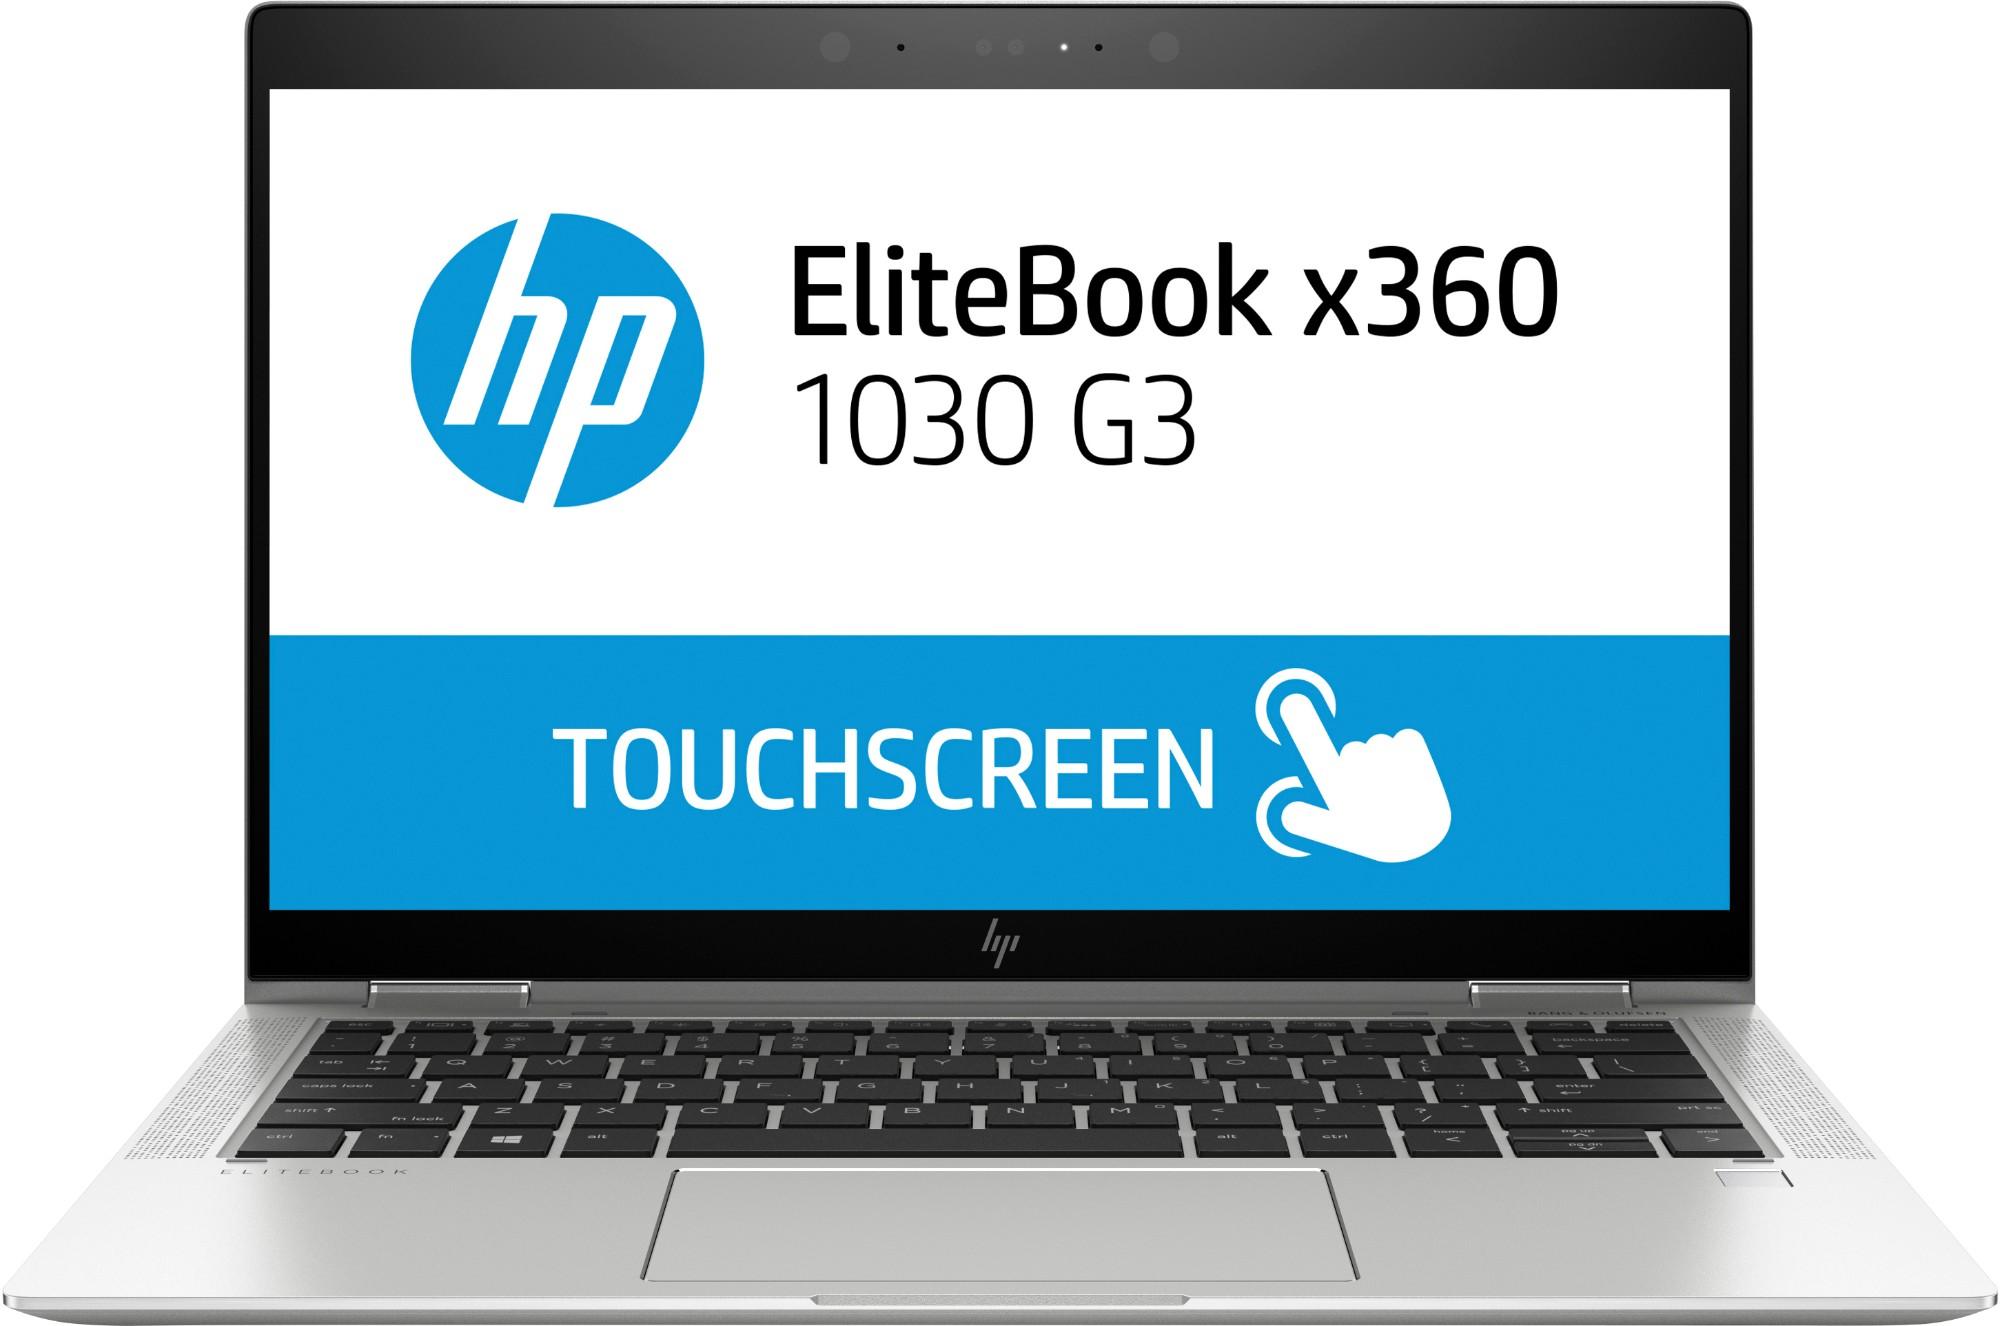 "HP EliteBook x360 1030 G3 Silver Hybrid (2-in-1) 33.8 cm (13.3"") 1920 x 1080 pixels Touchscreen 8th gen Intel® Core™ i5 i5-8350U 8 GB LPDDR3-SDRAM 256 GB SSD"